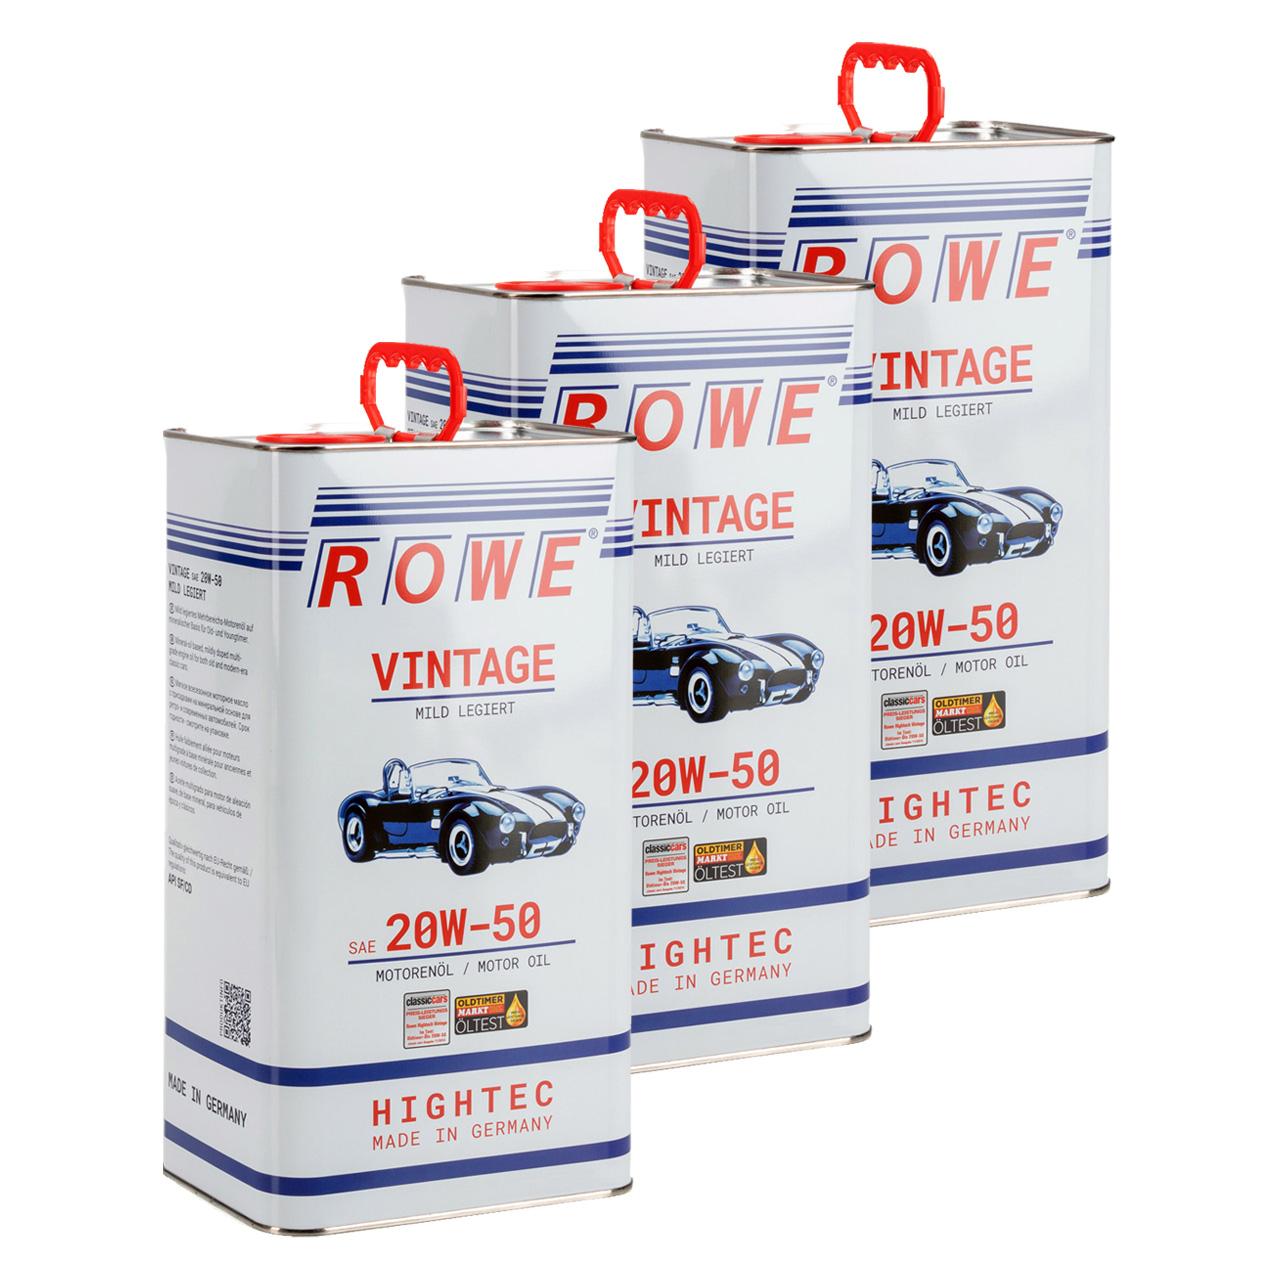 15 Liter ROWE Motoröl Öl VINTAGE Mild Legiert SAE 20W50 Oldtimer Mehrbereichs-Öl